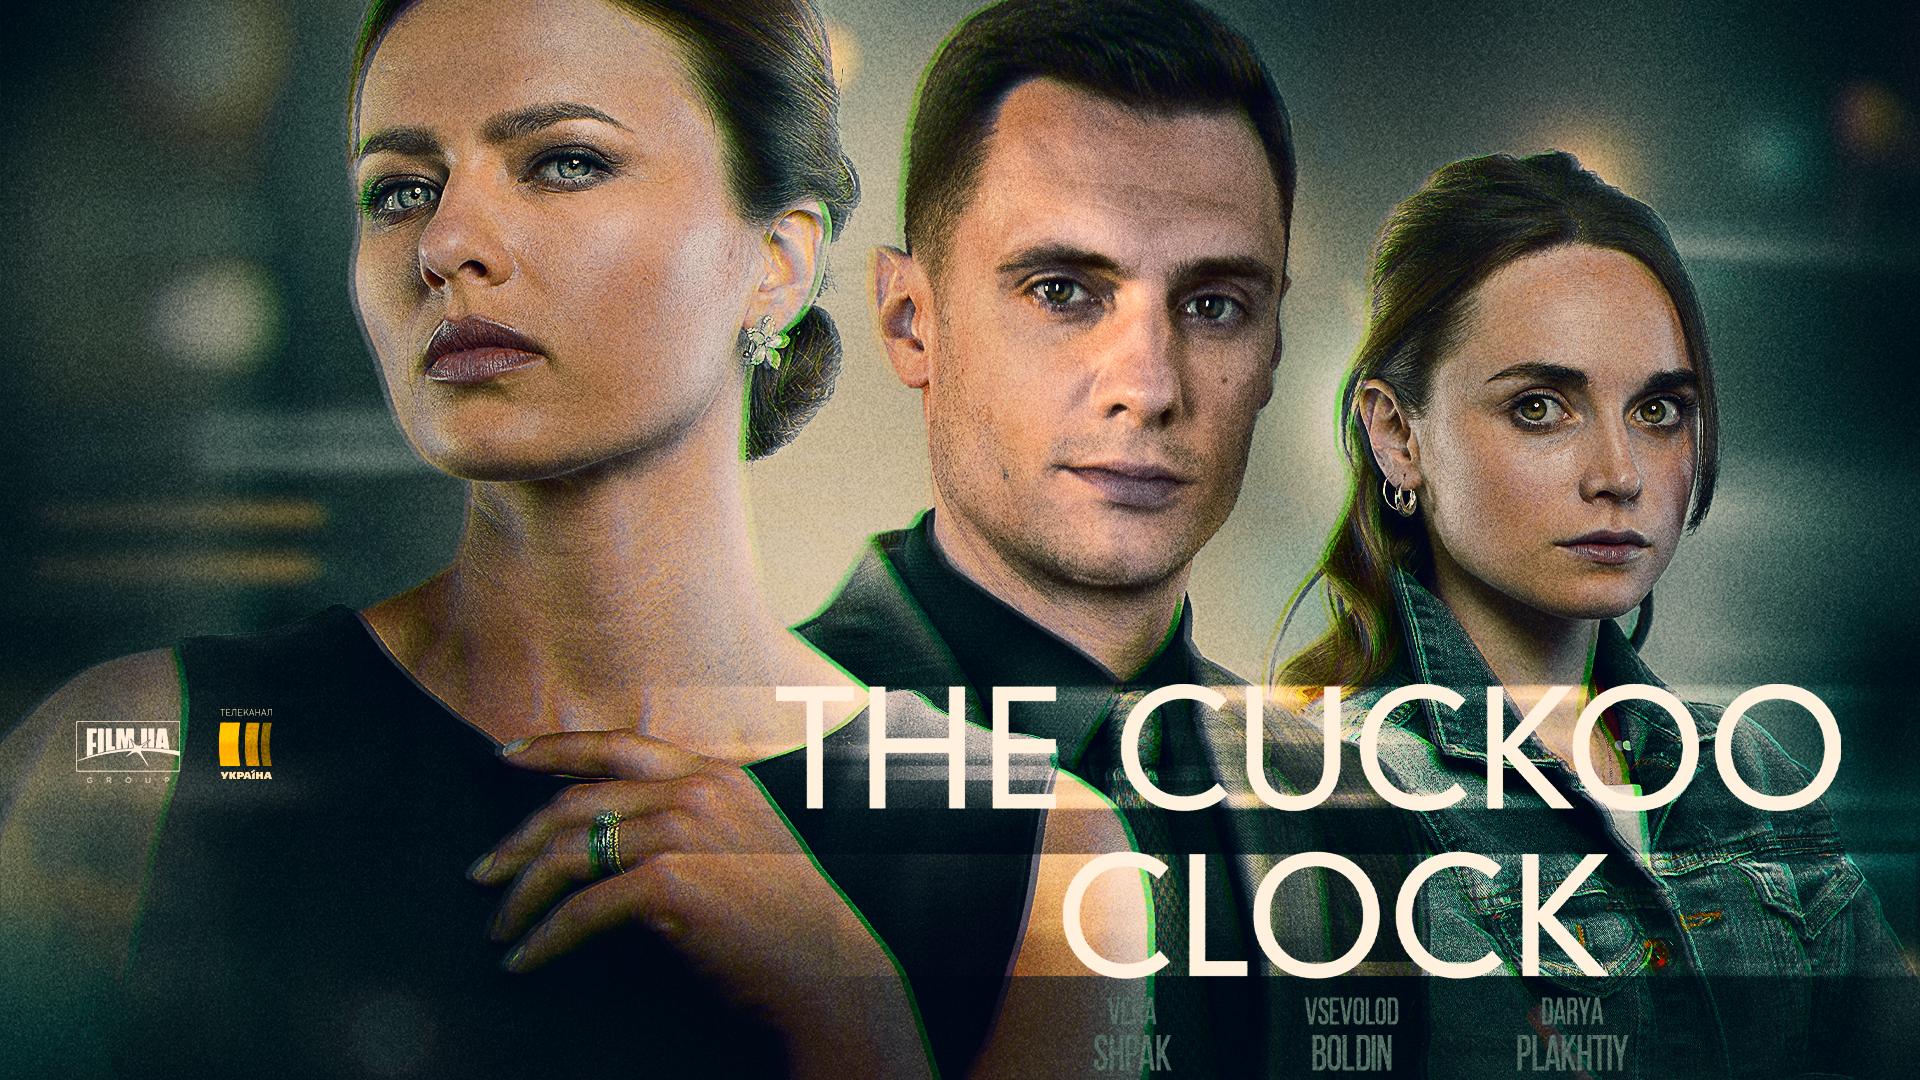 The Cuckoo Clock - Season 1